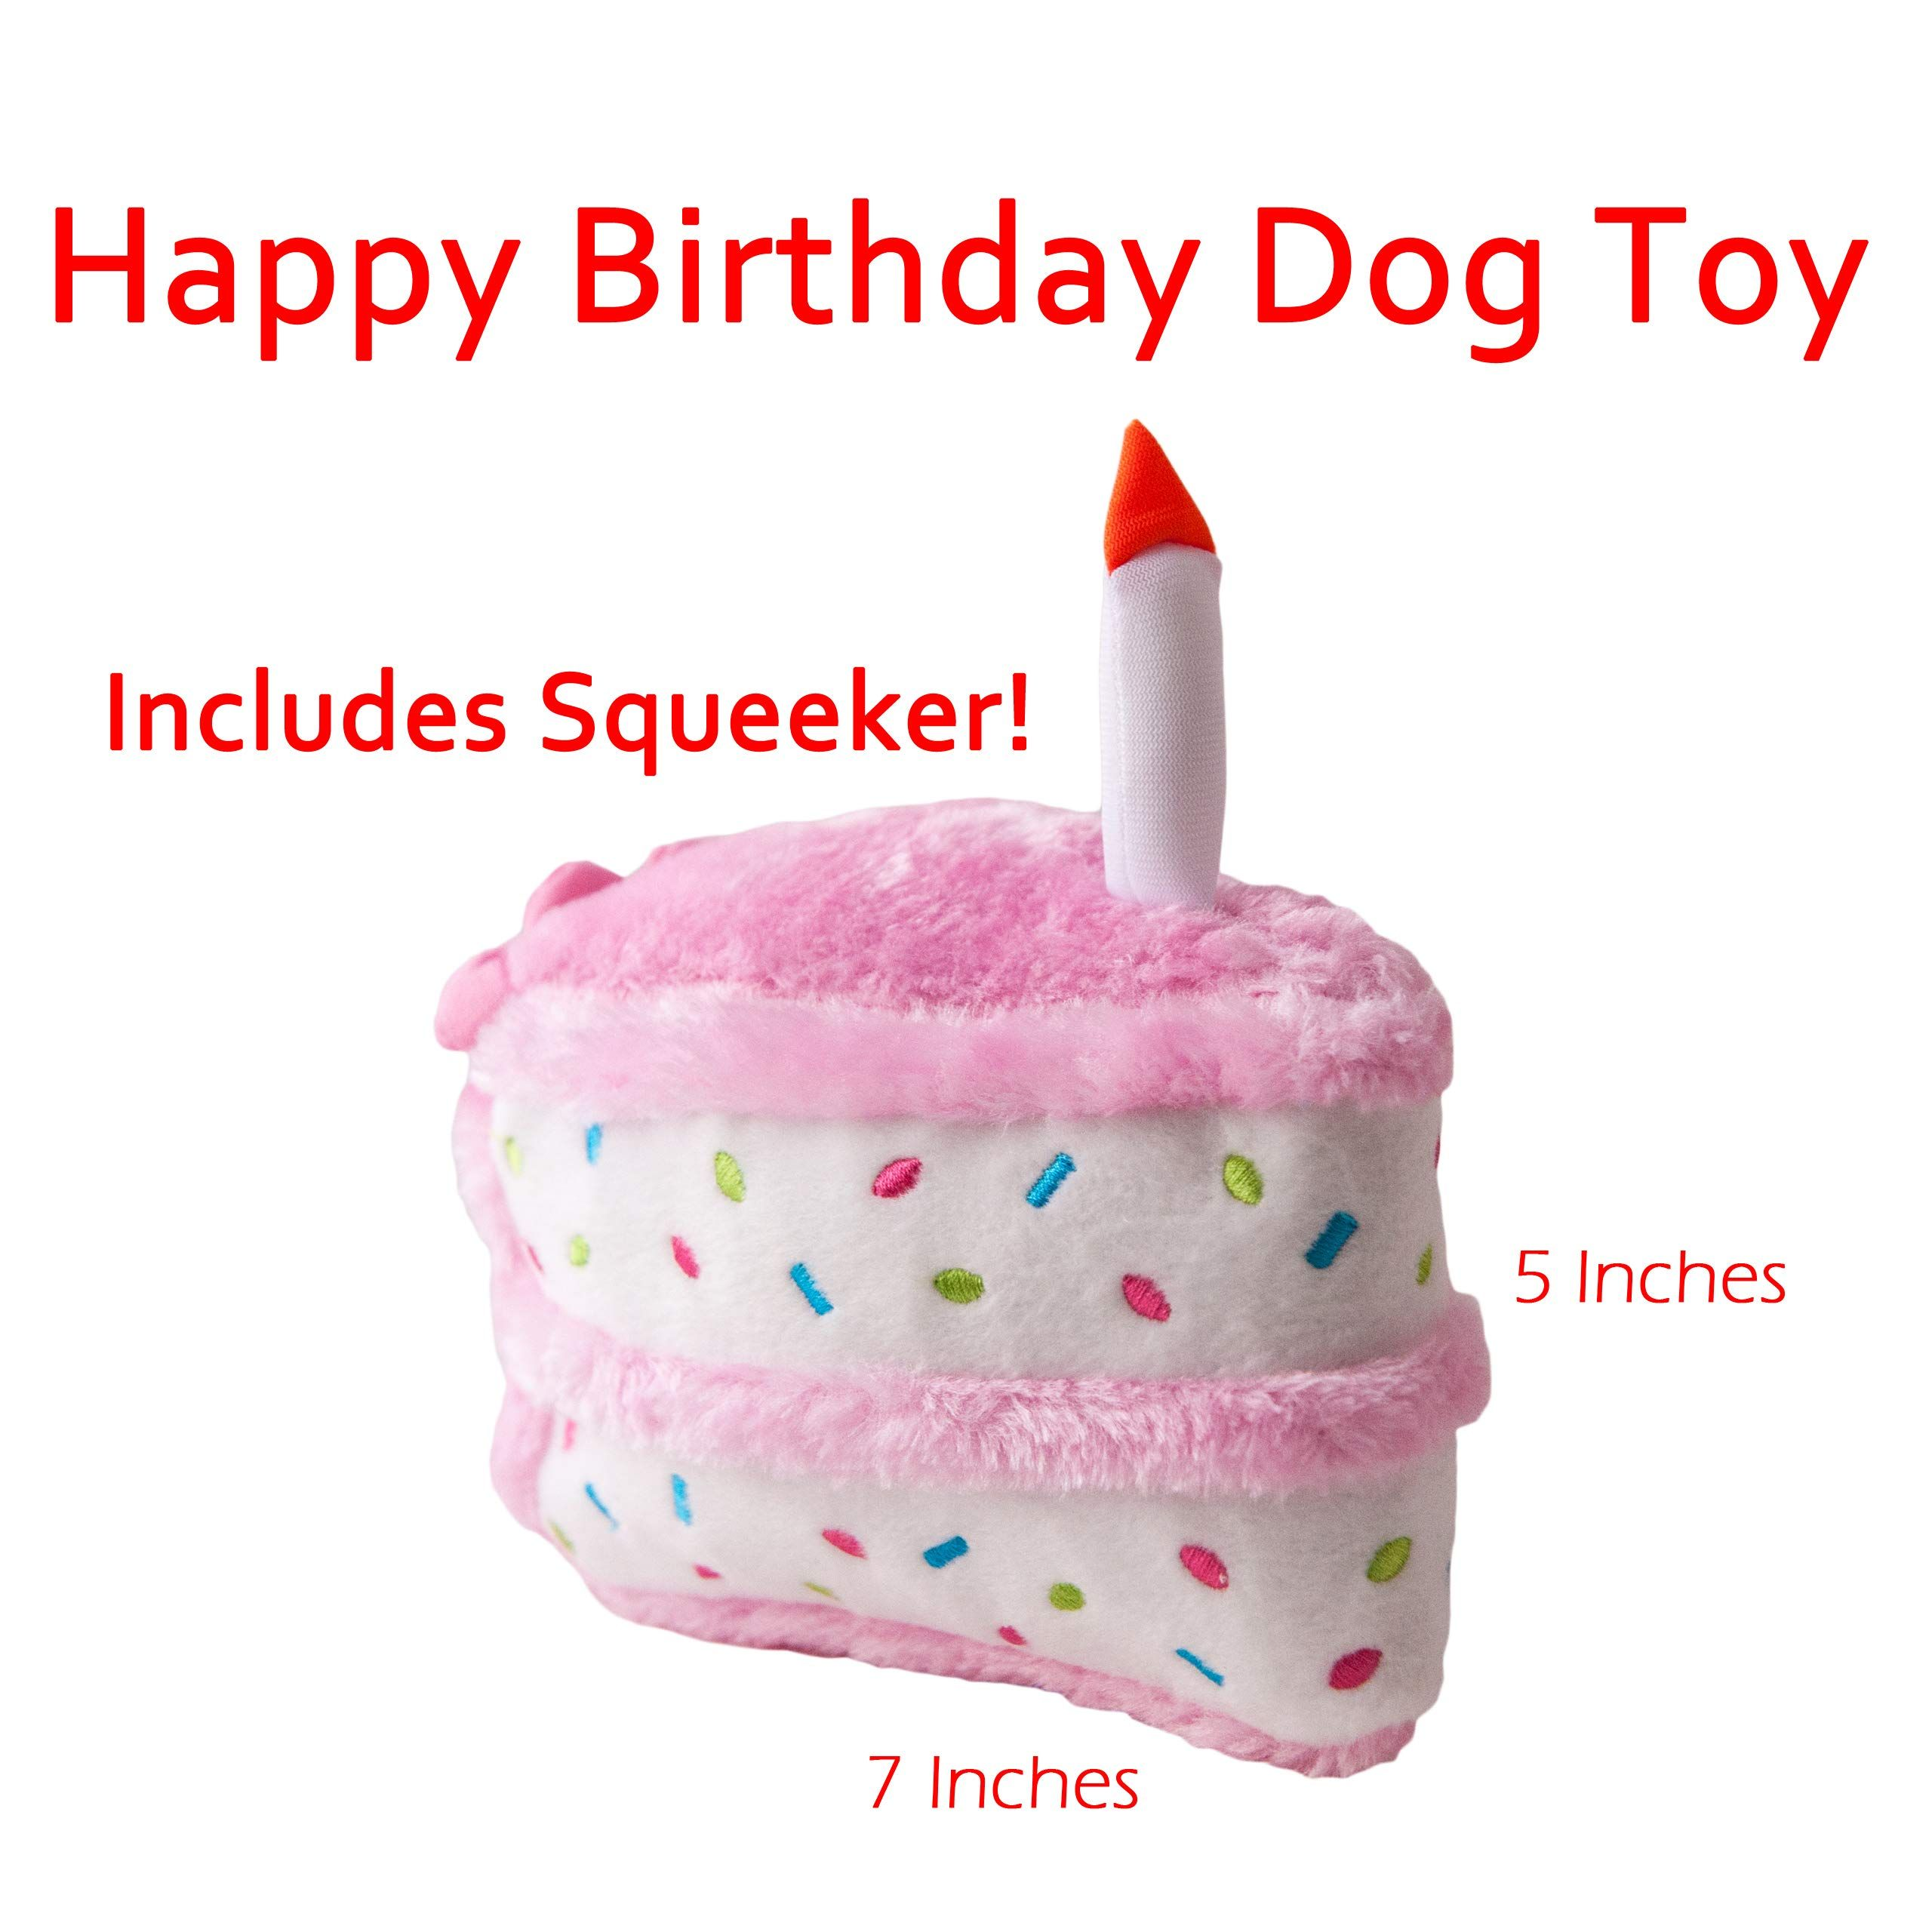 Fantastic Zippypaws Dog Birthday Toy Squeaky Chew Pink Birthday Cake Dog Funny Birthday Cards Online Alyptdamsfinfo